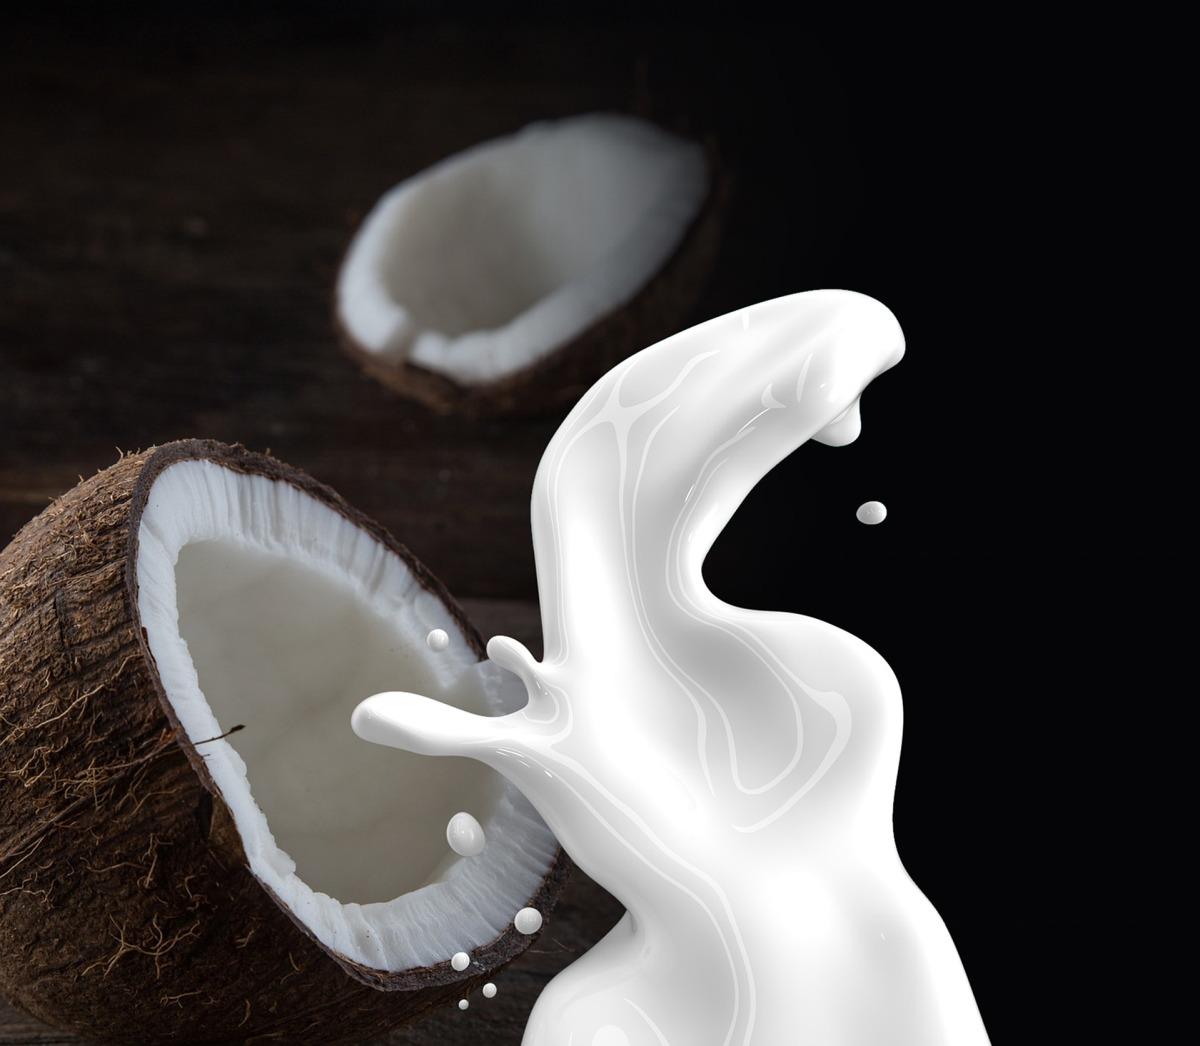 My Five Most Favorite Asian Cooking Ingredients - Coconut milk